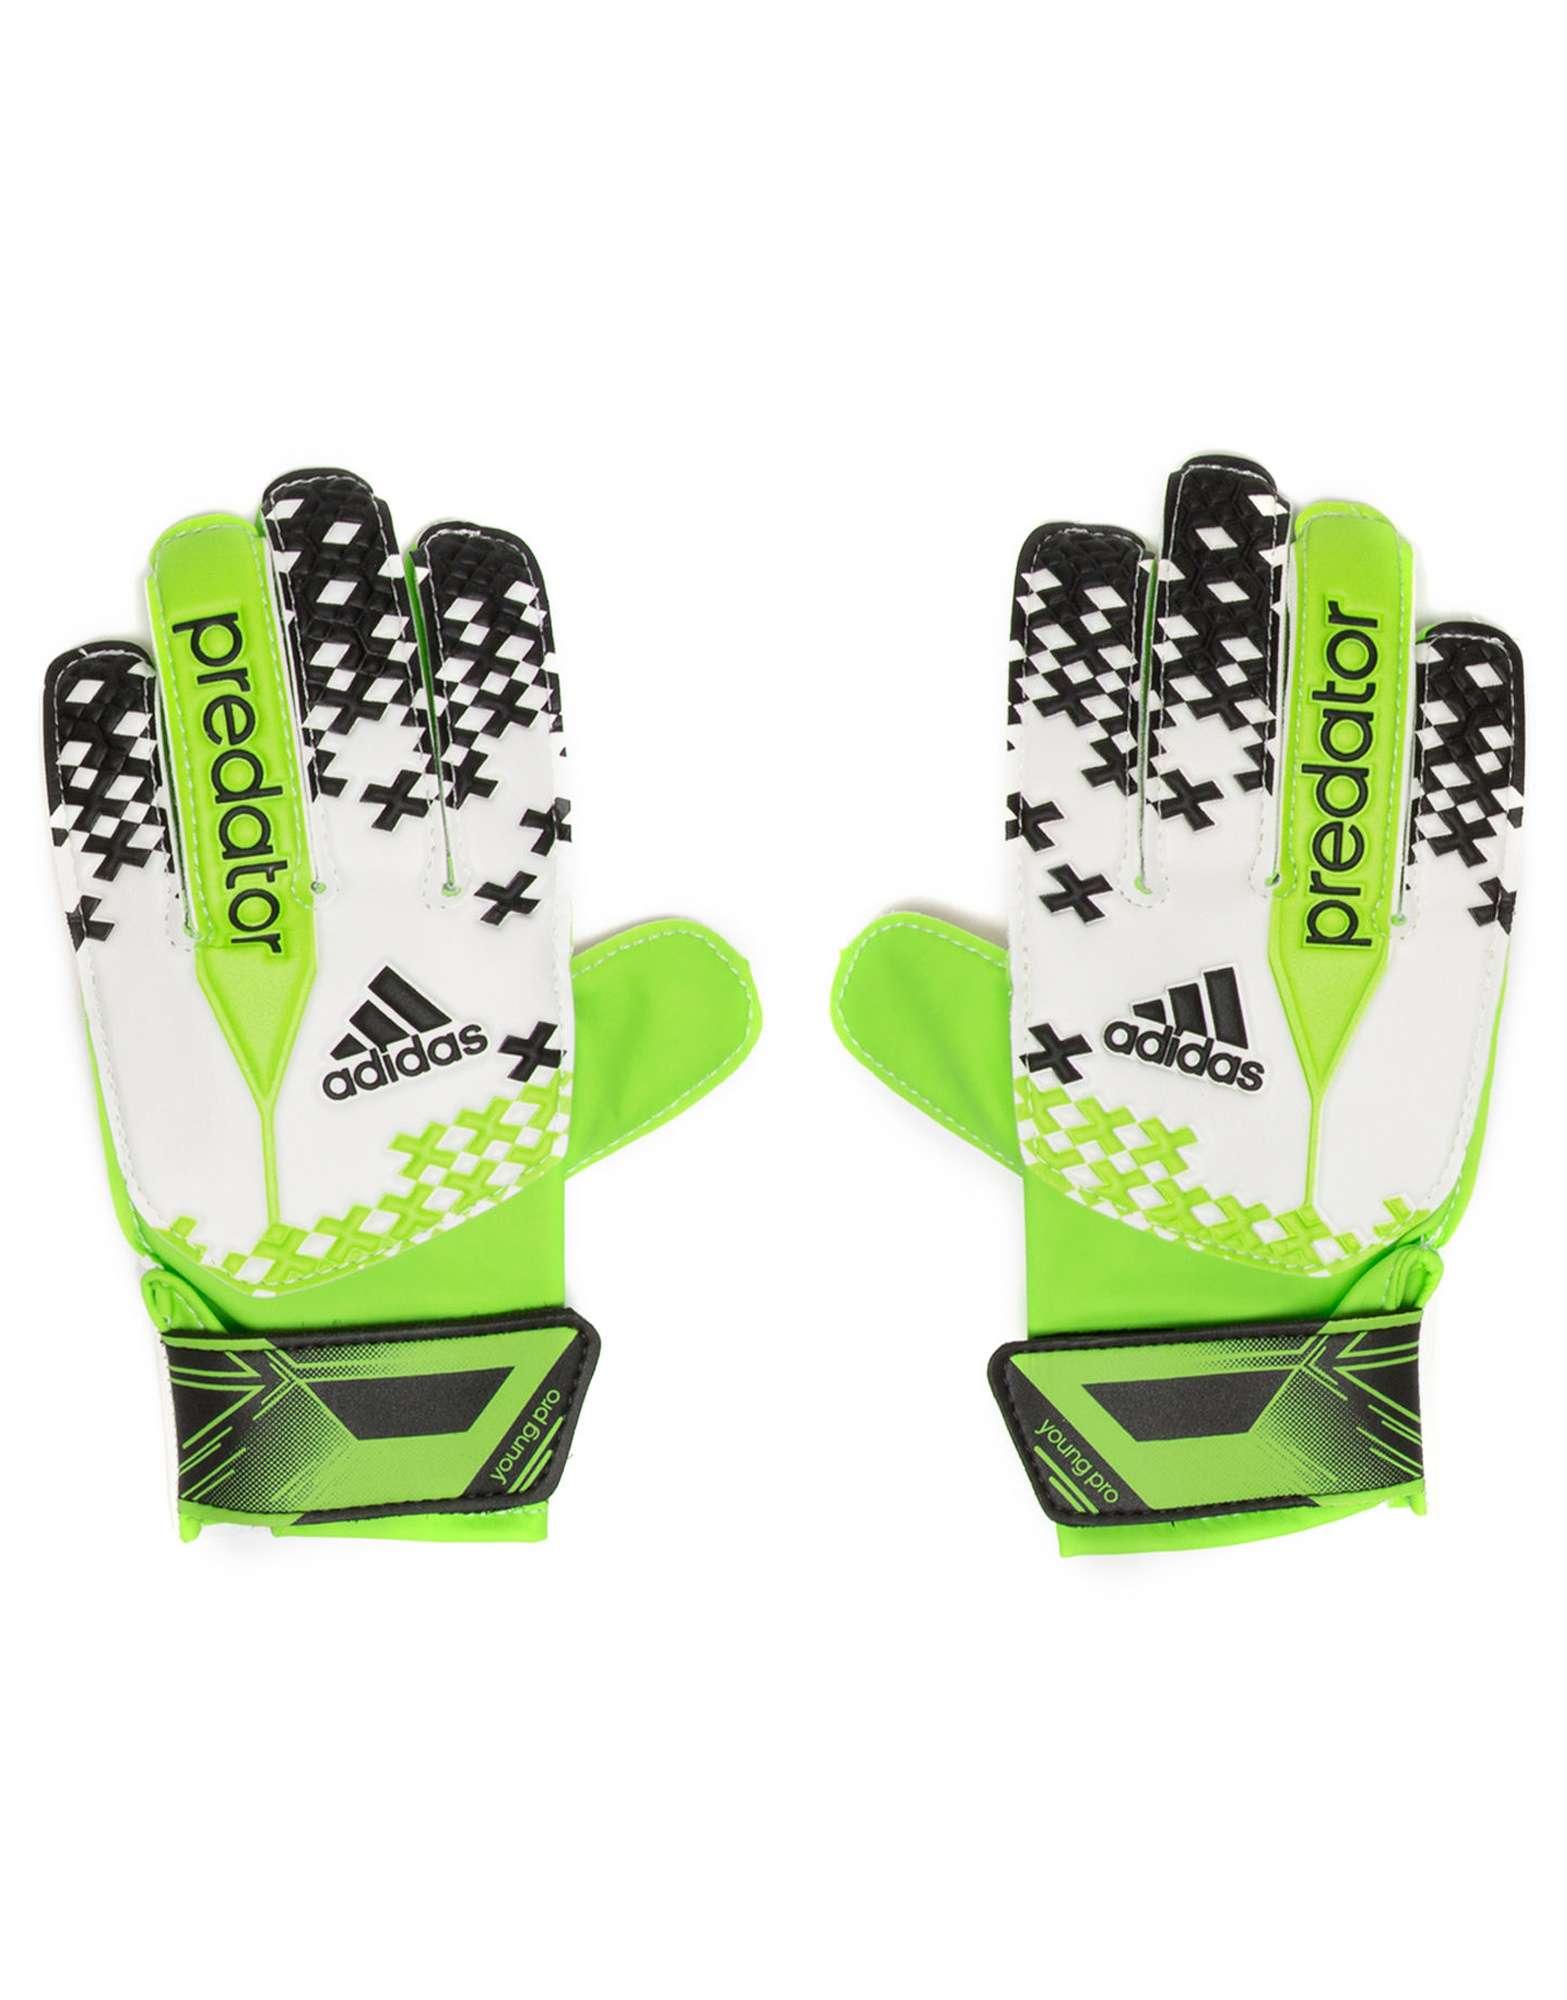 adidas Predator Young Pro Goalkeeper Gloves